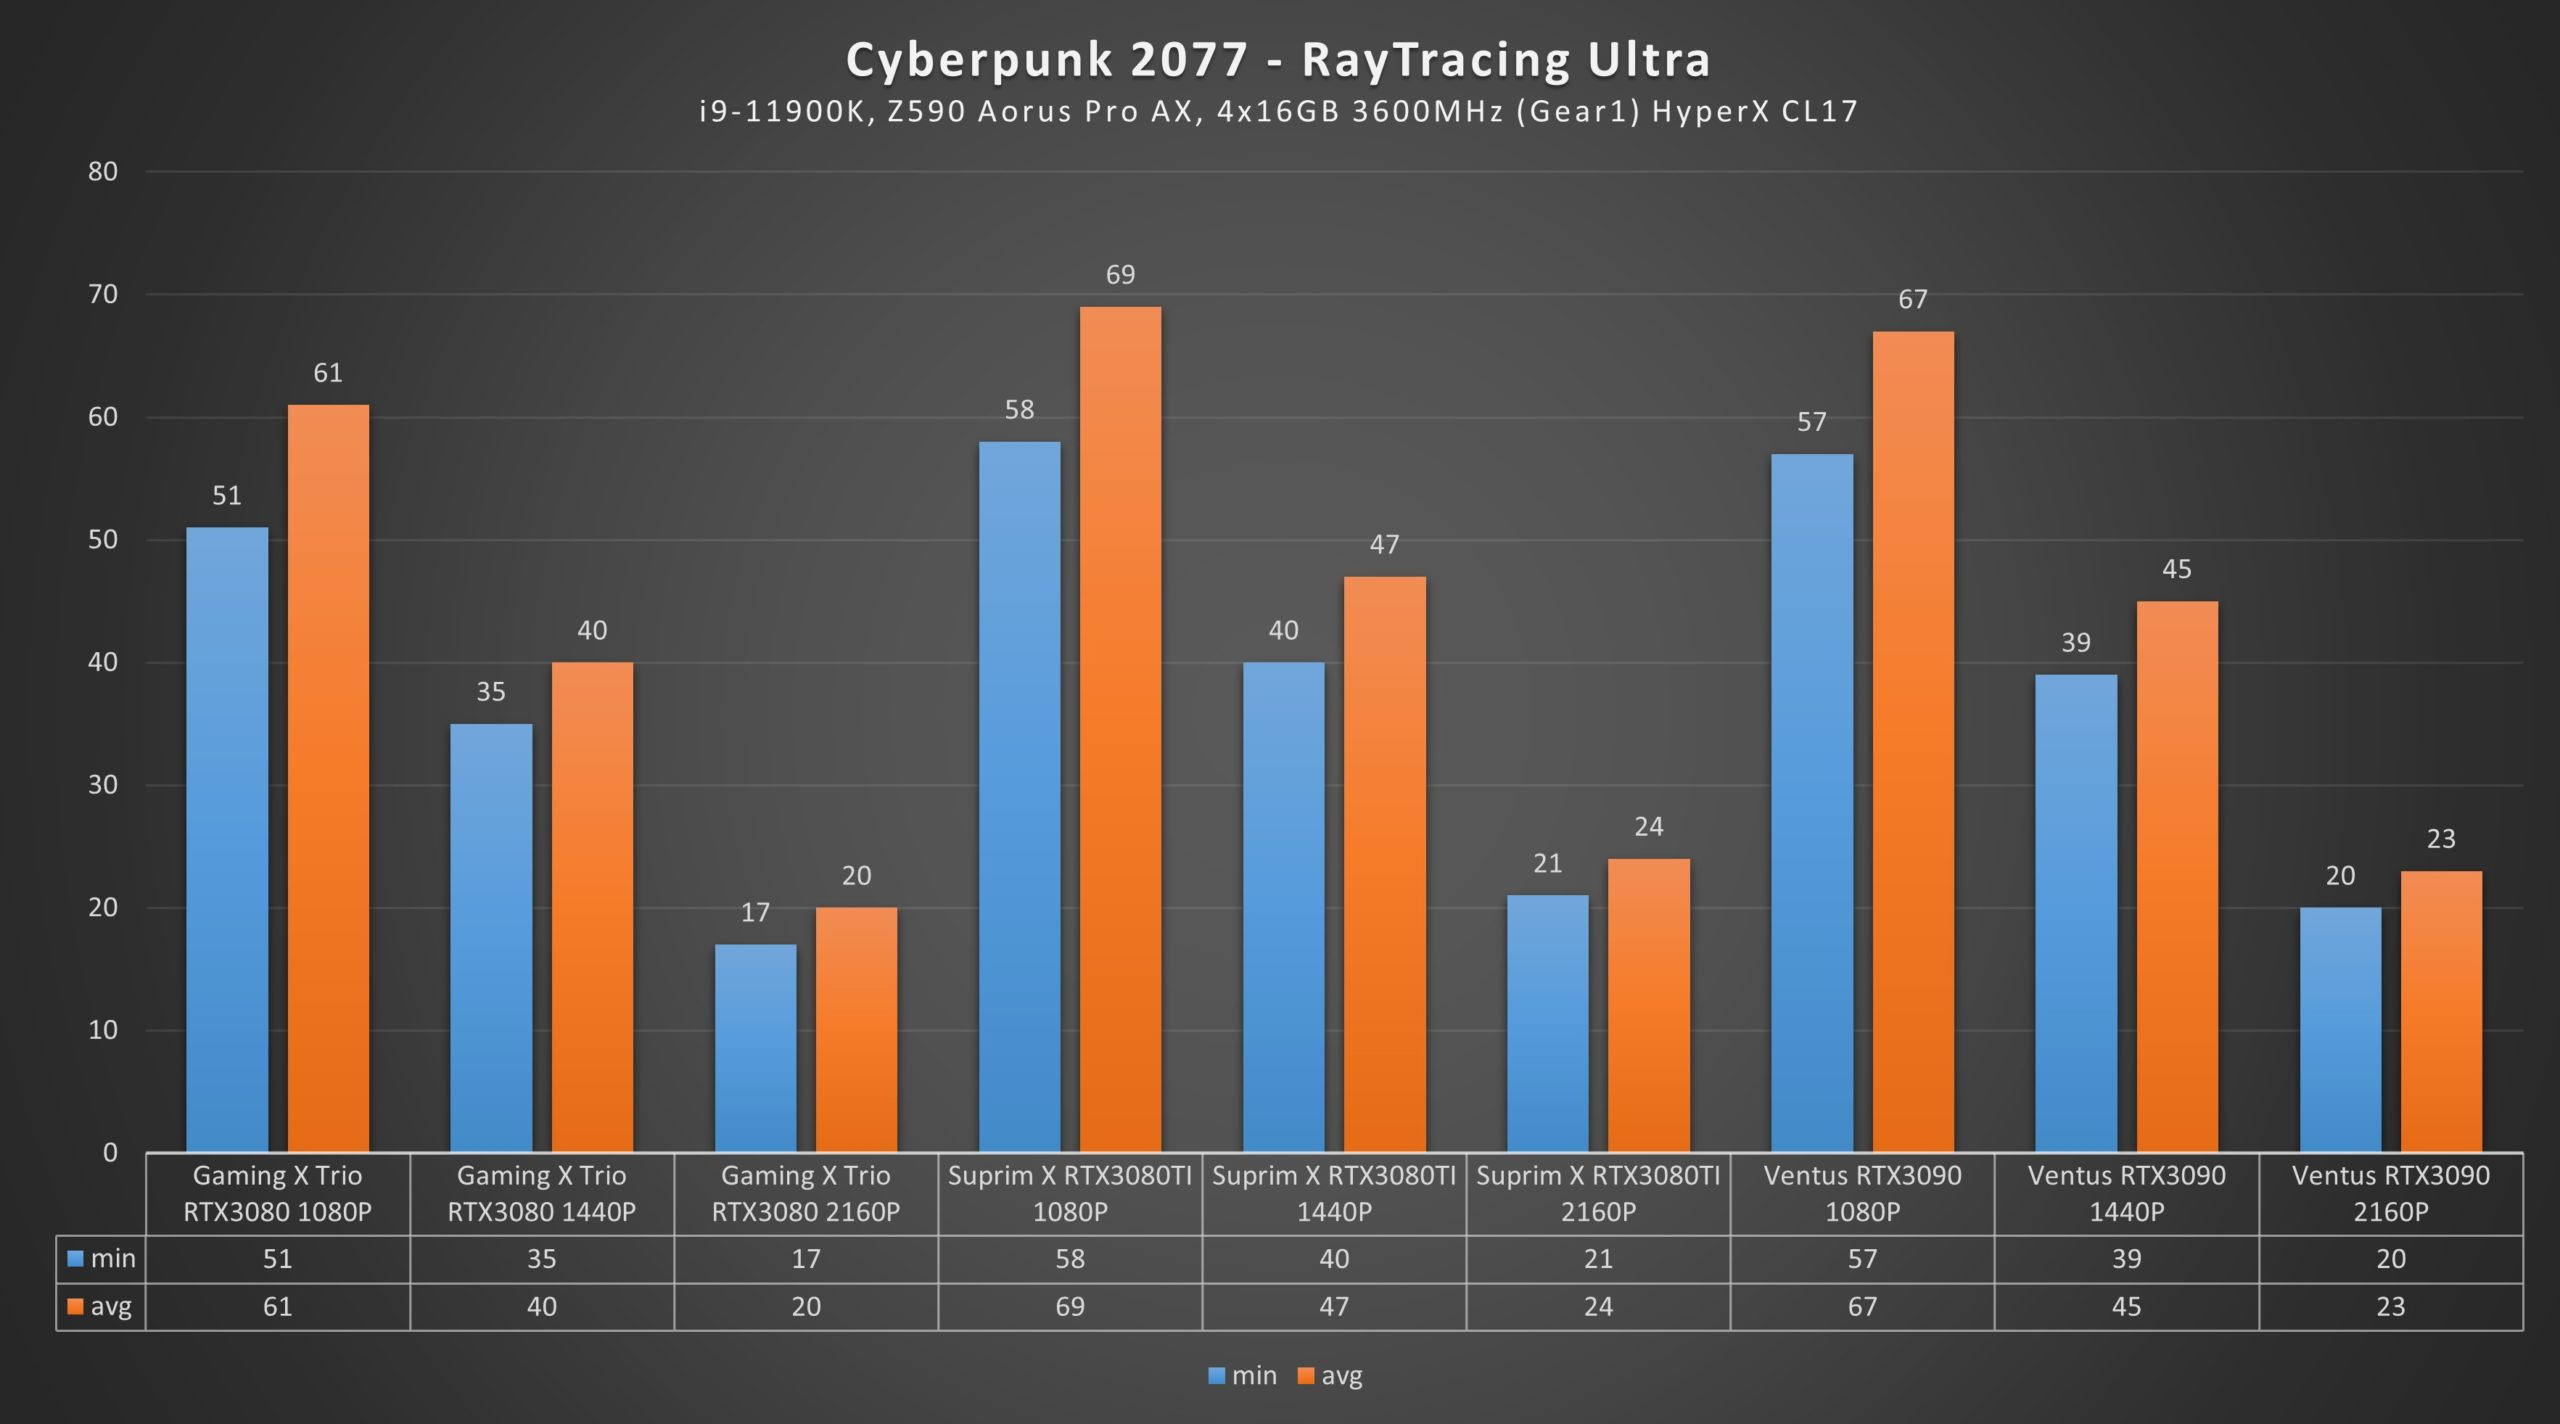 RTX 3080 Ti Cyberpunk 2077 Ultra Raytracing